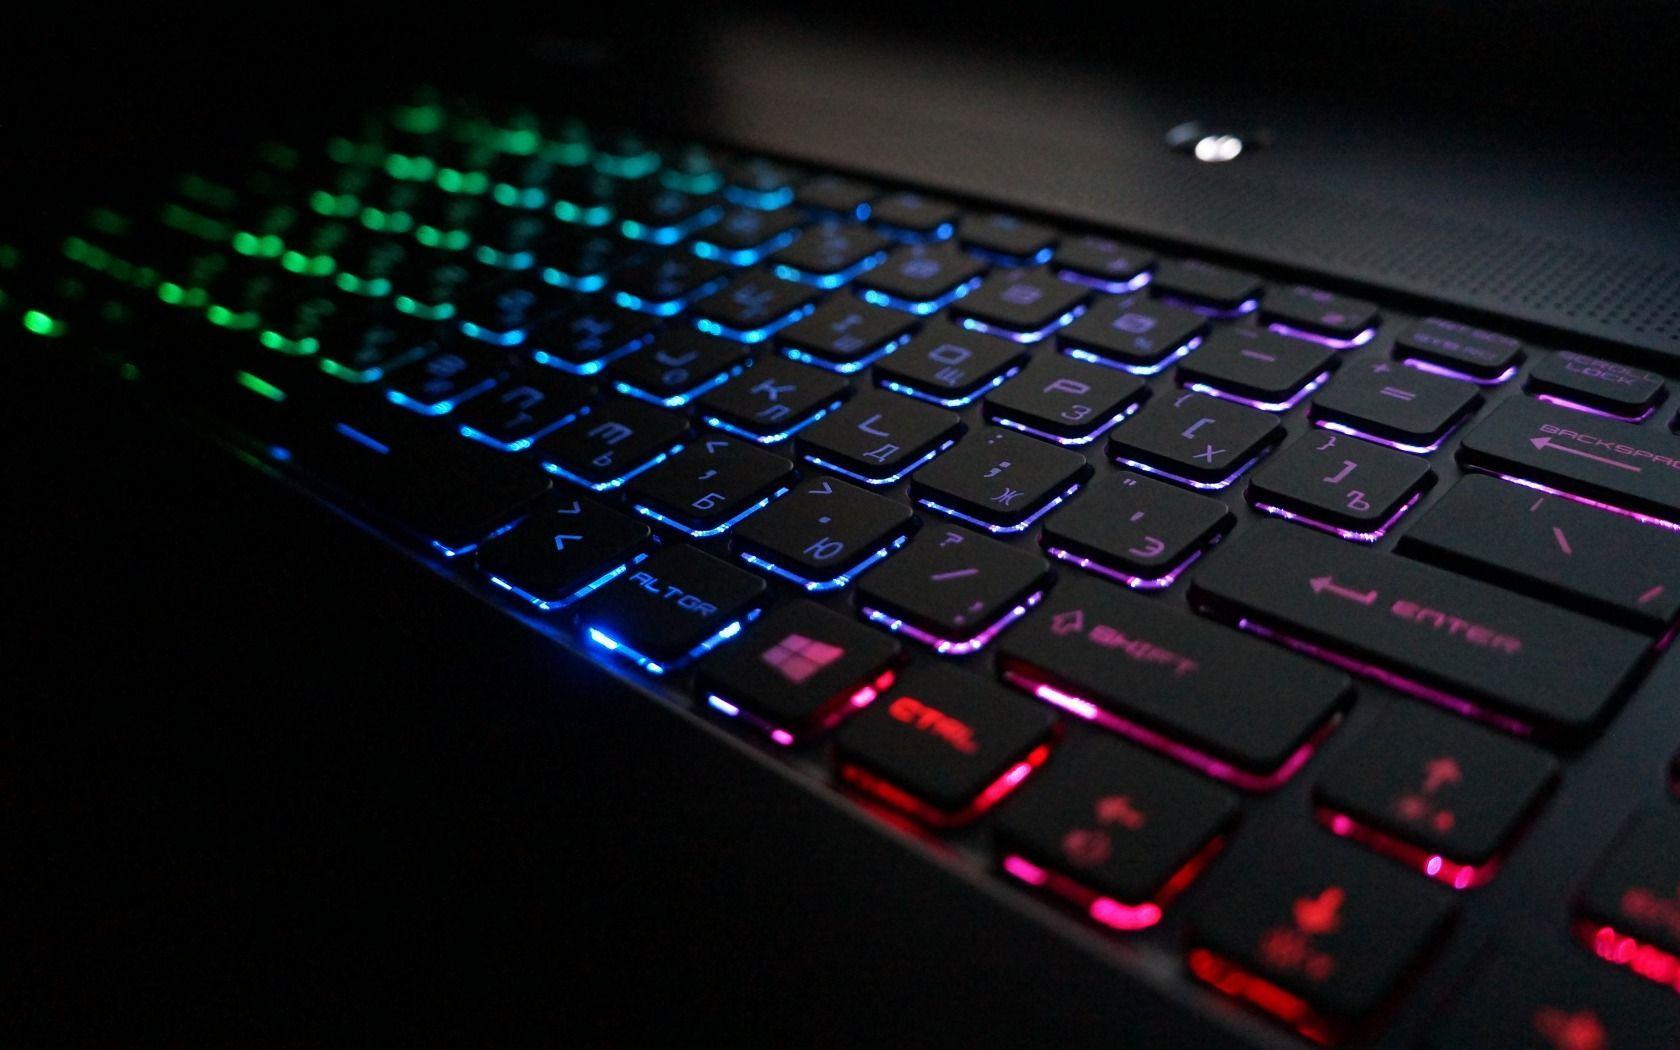 Keyboard Wallpapers Top Free Keyboard Backgrounds Wallpaperaccess